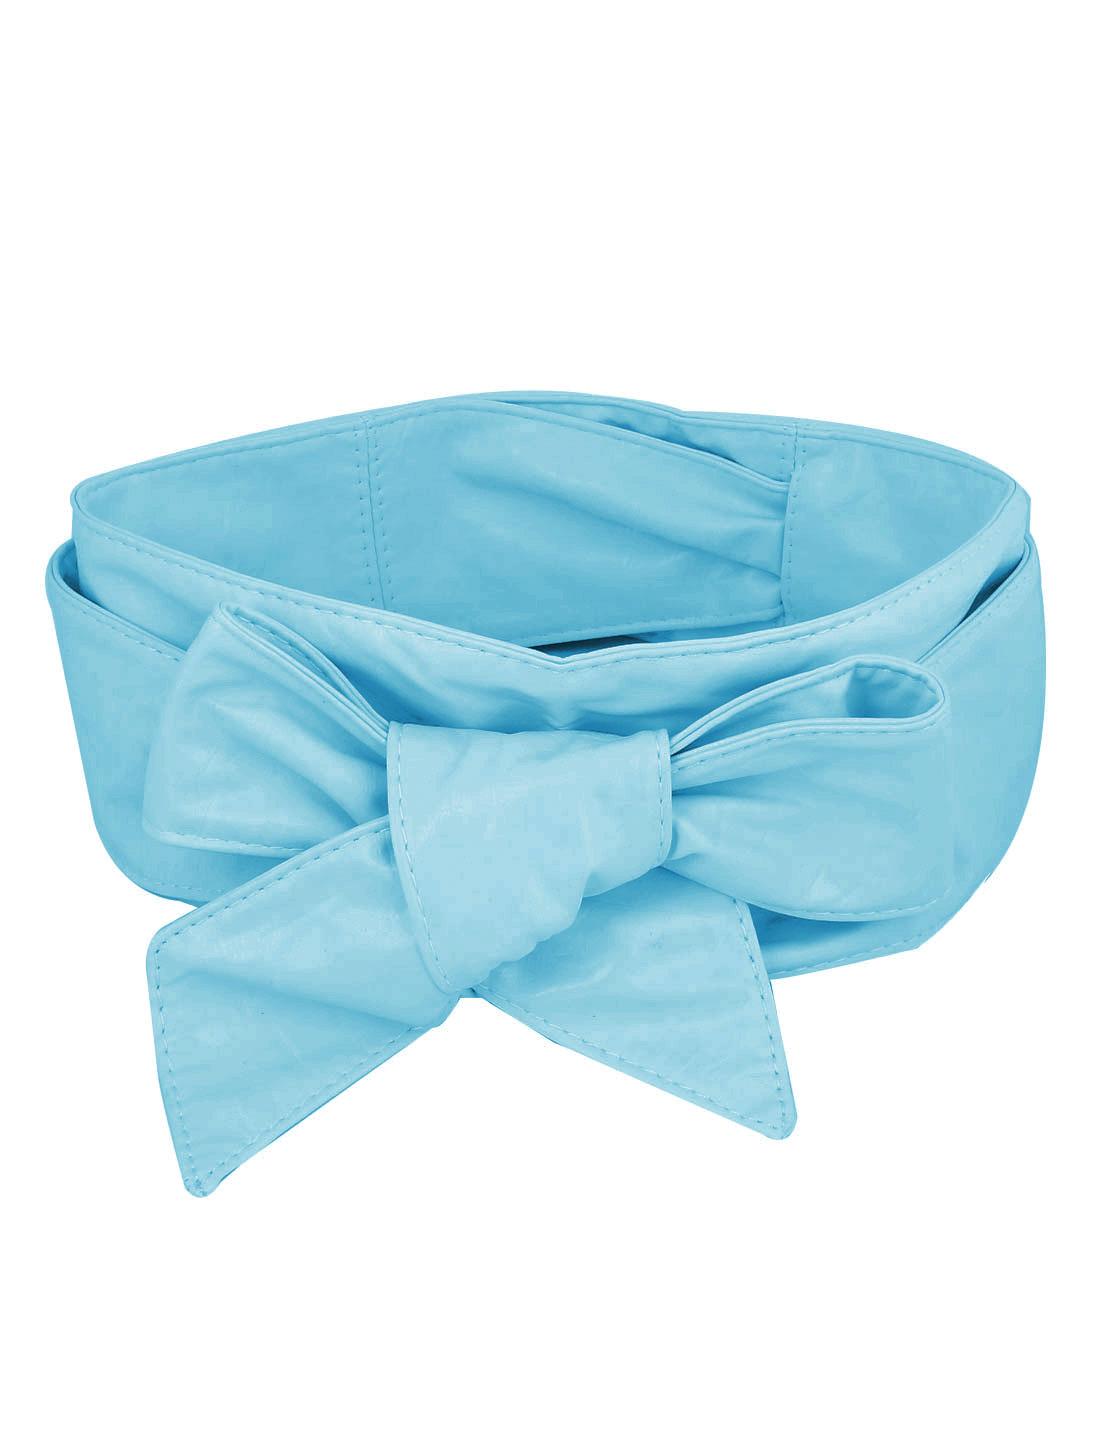 Lady Faux Leather Corset Cinch Waistband Belt Strap Blue